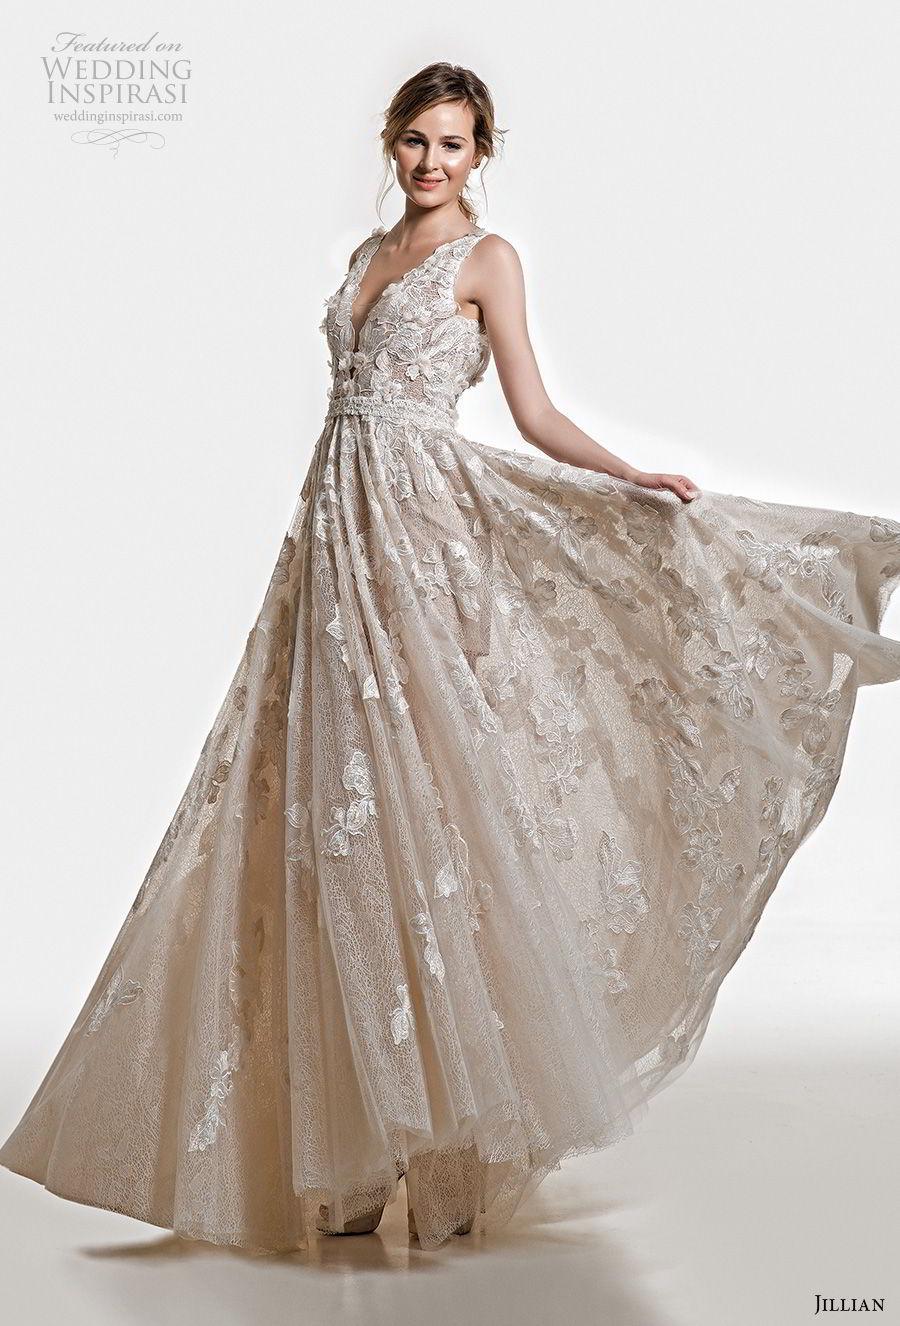 jillian 2019 bridal sleeveless deep v neck full embellishment romantic champagne ivory a  line wedding dress open v back chapel train (16) mv